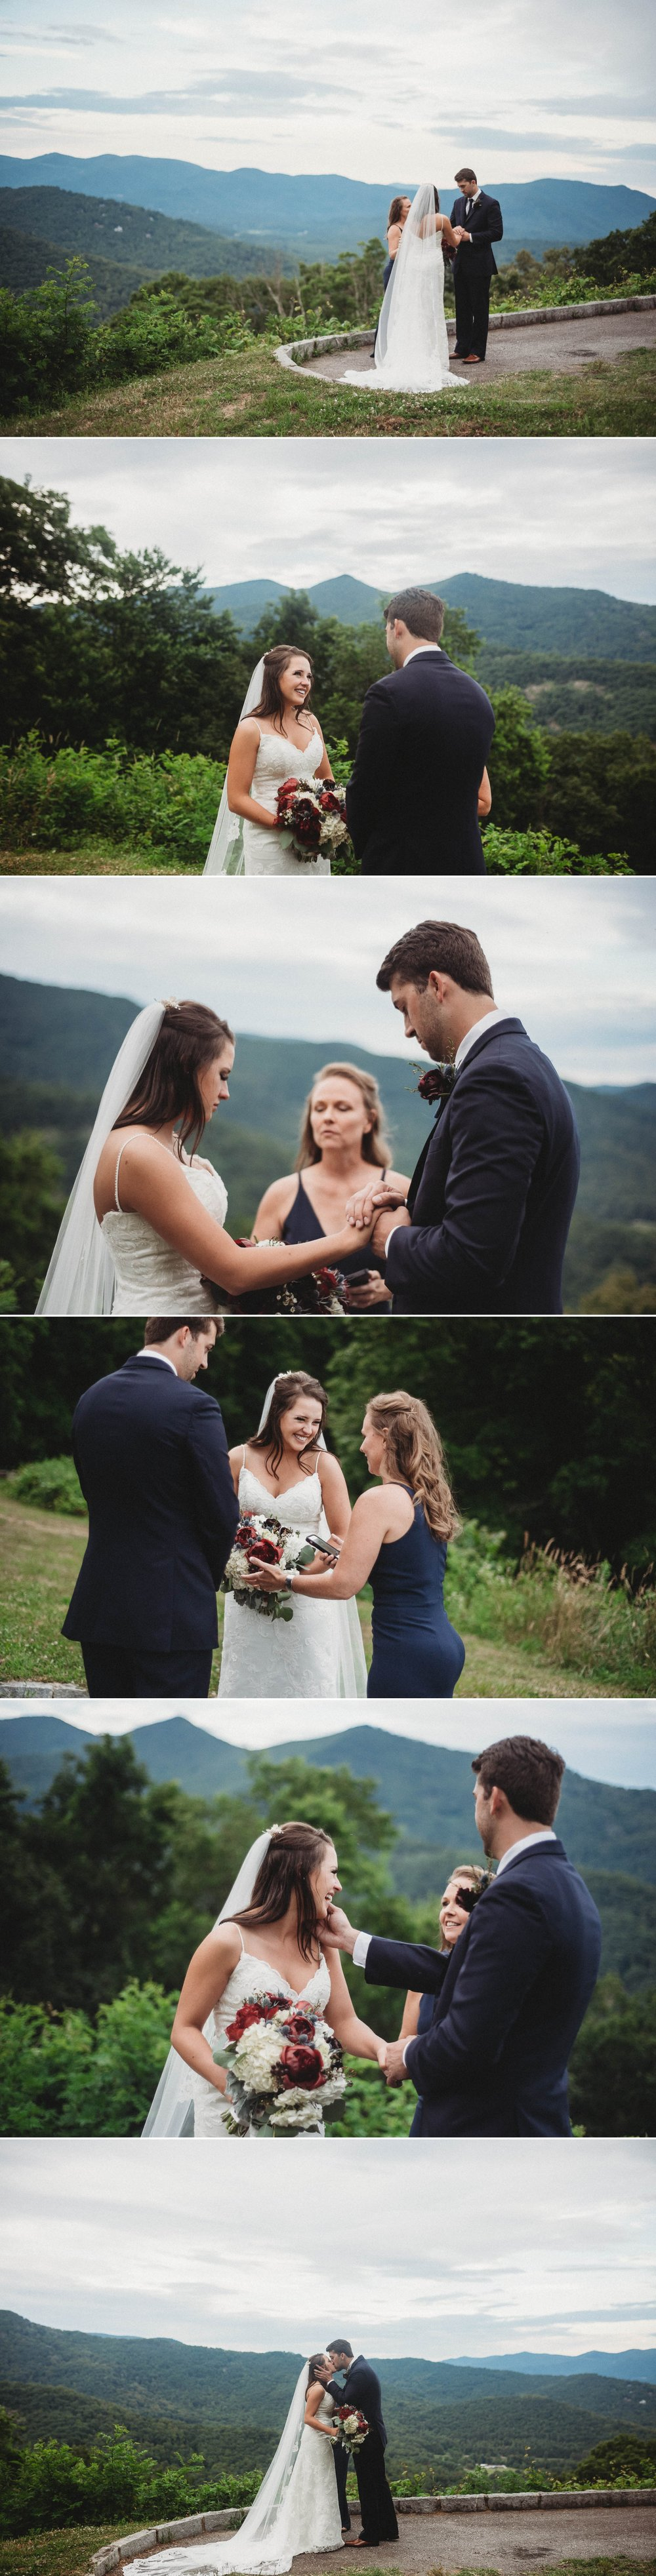 Elopement Wedding Ceremony at Tanbark Ridge Overlook Megan + Jon - Run away Elopement at the Blue Ridge Park Way in Asheville, North Carolina